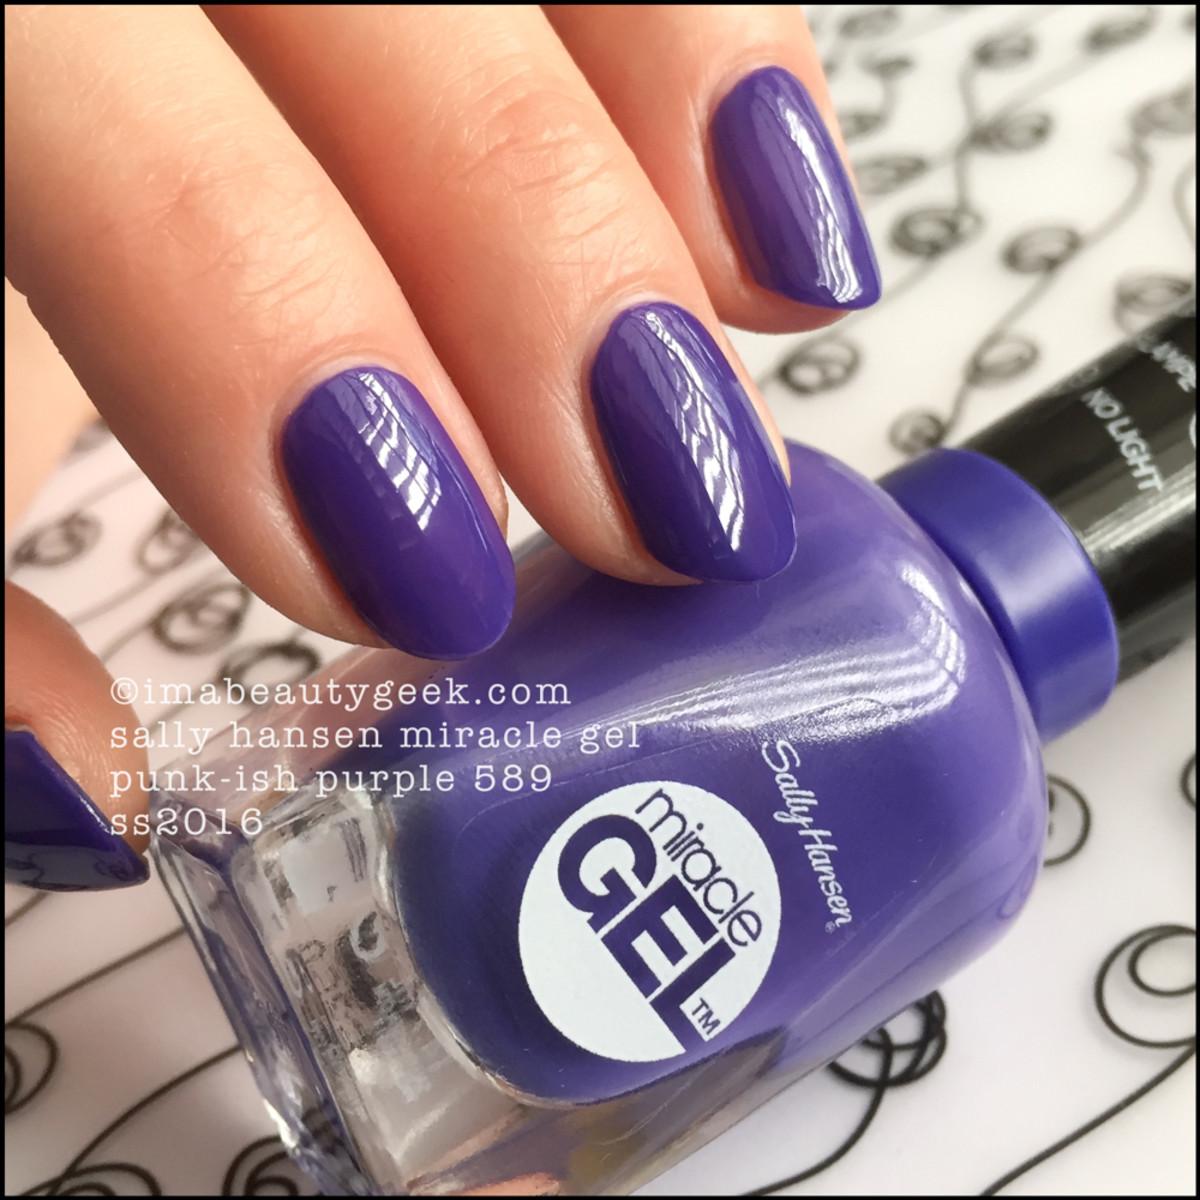 Sally Hansen Punkish Purple_Sally Hansen Miracle Gel Swatches